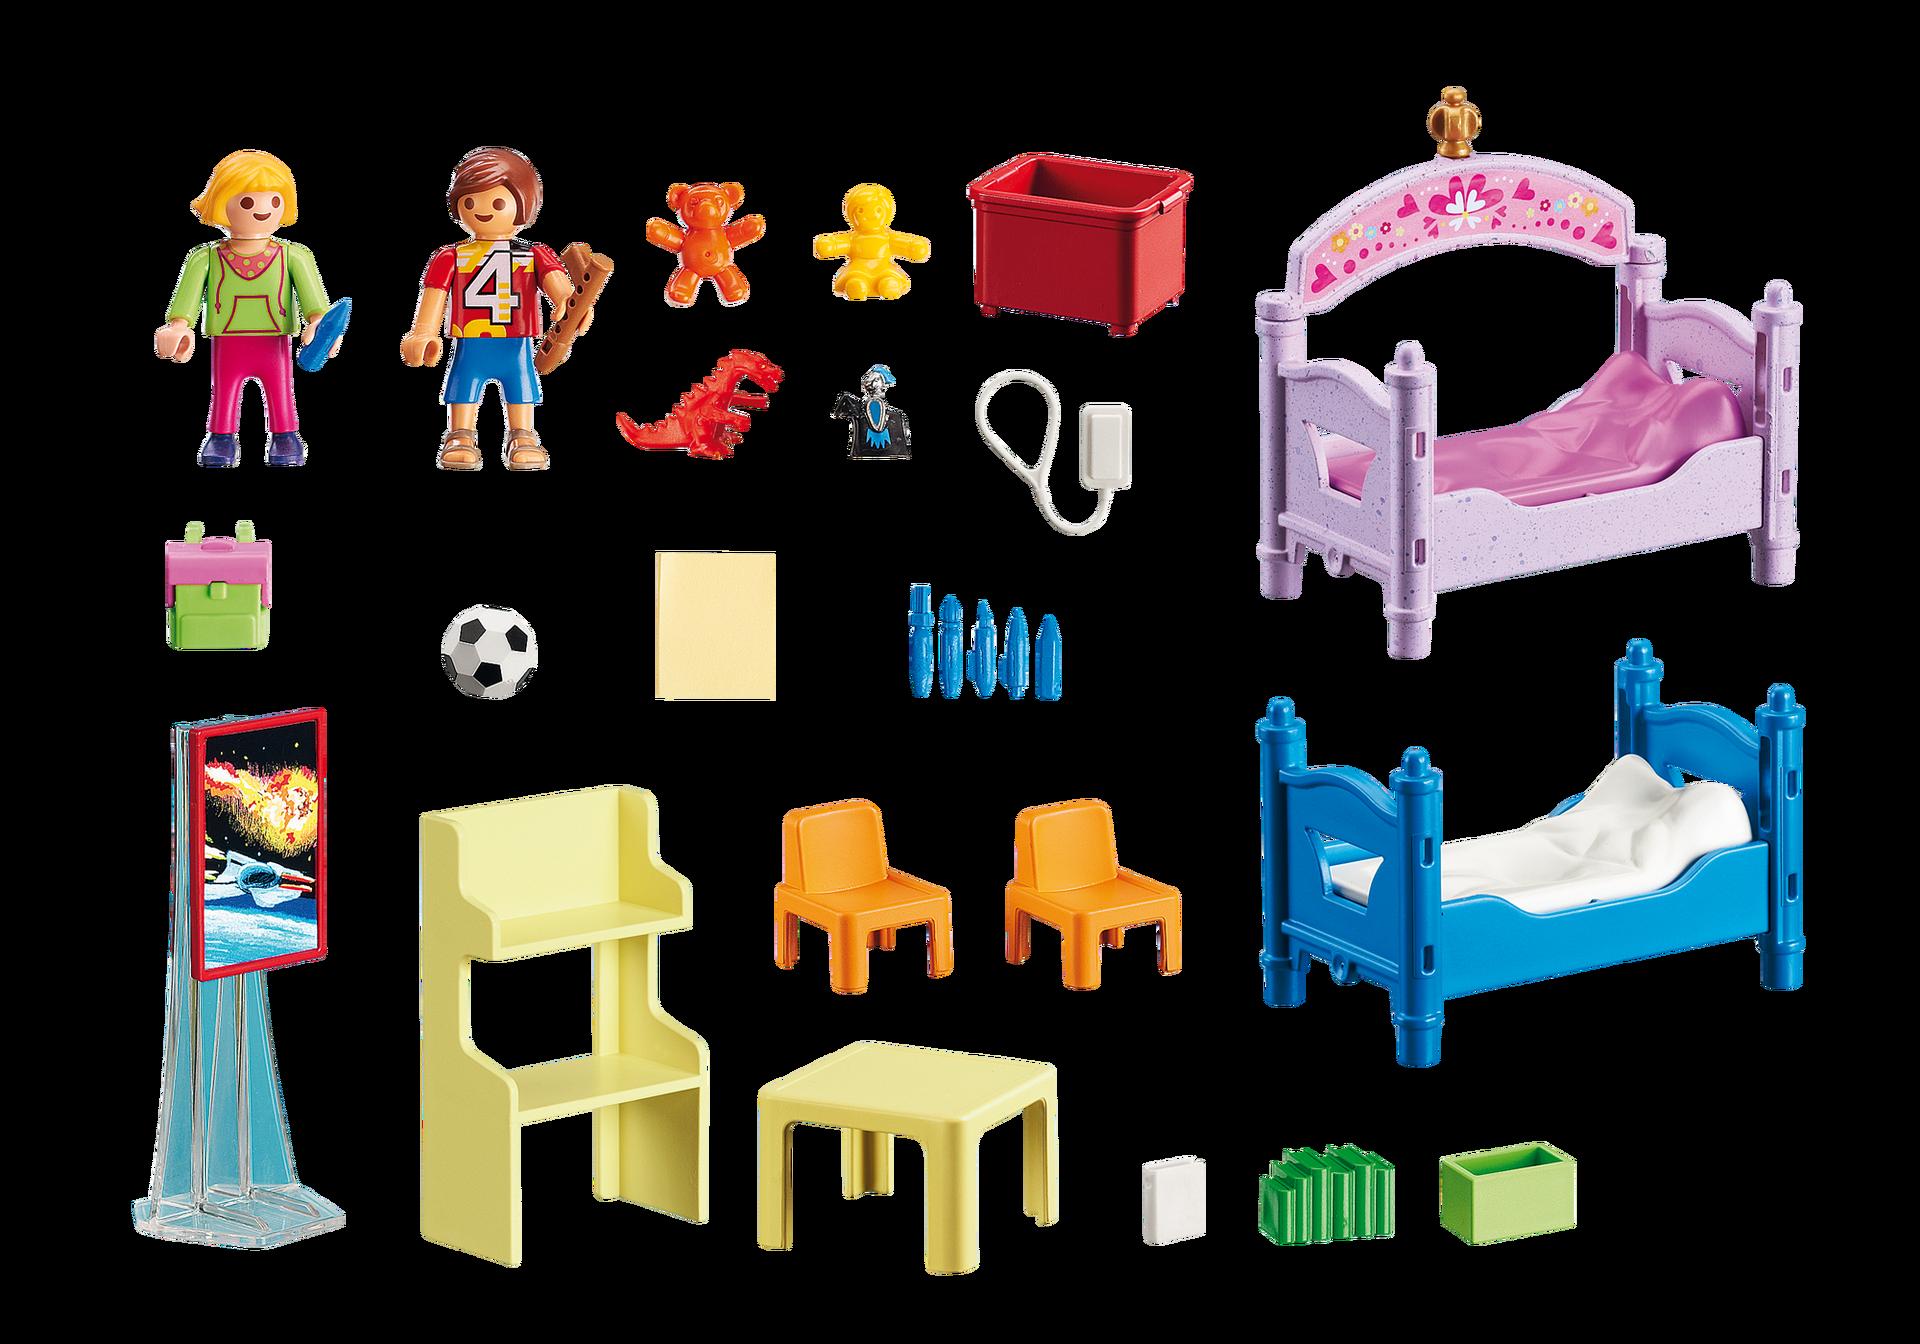 chambre d 39 enfants avec lits superpos s 5306 playmobil france. Black Bedroom Furniture Sets. Home Design Ideas